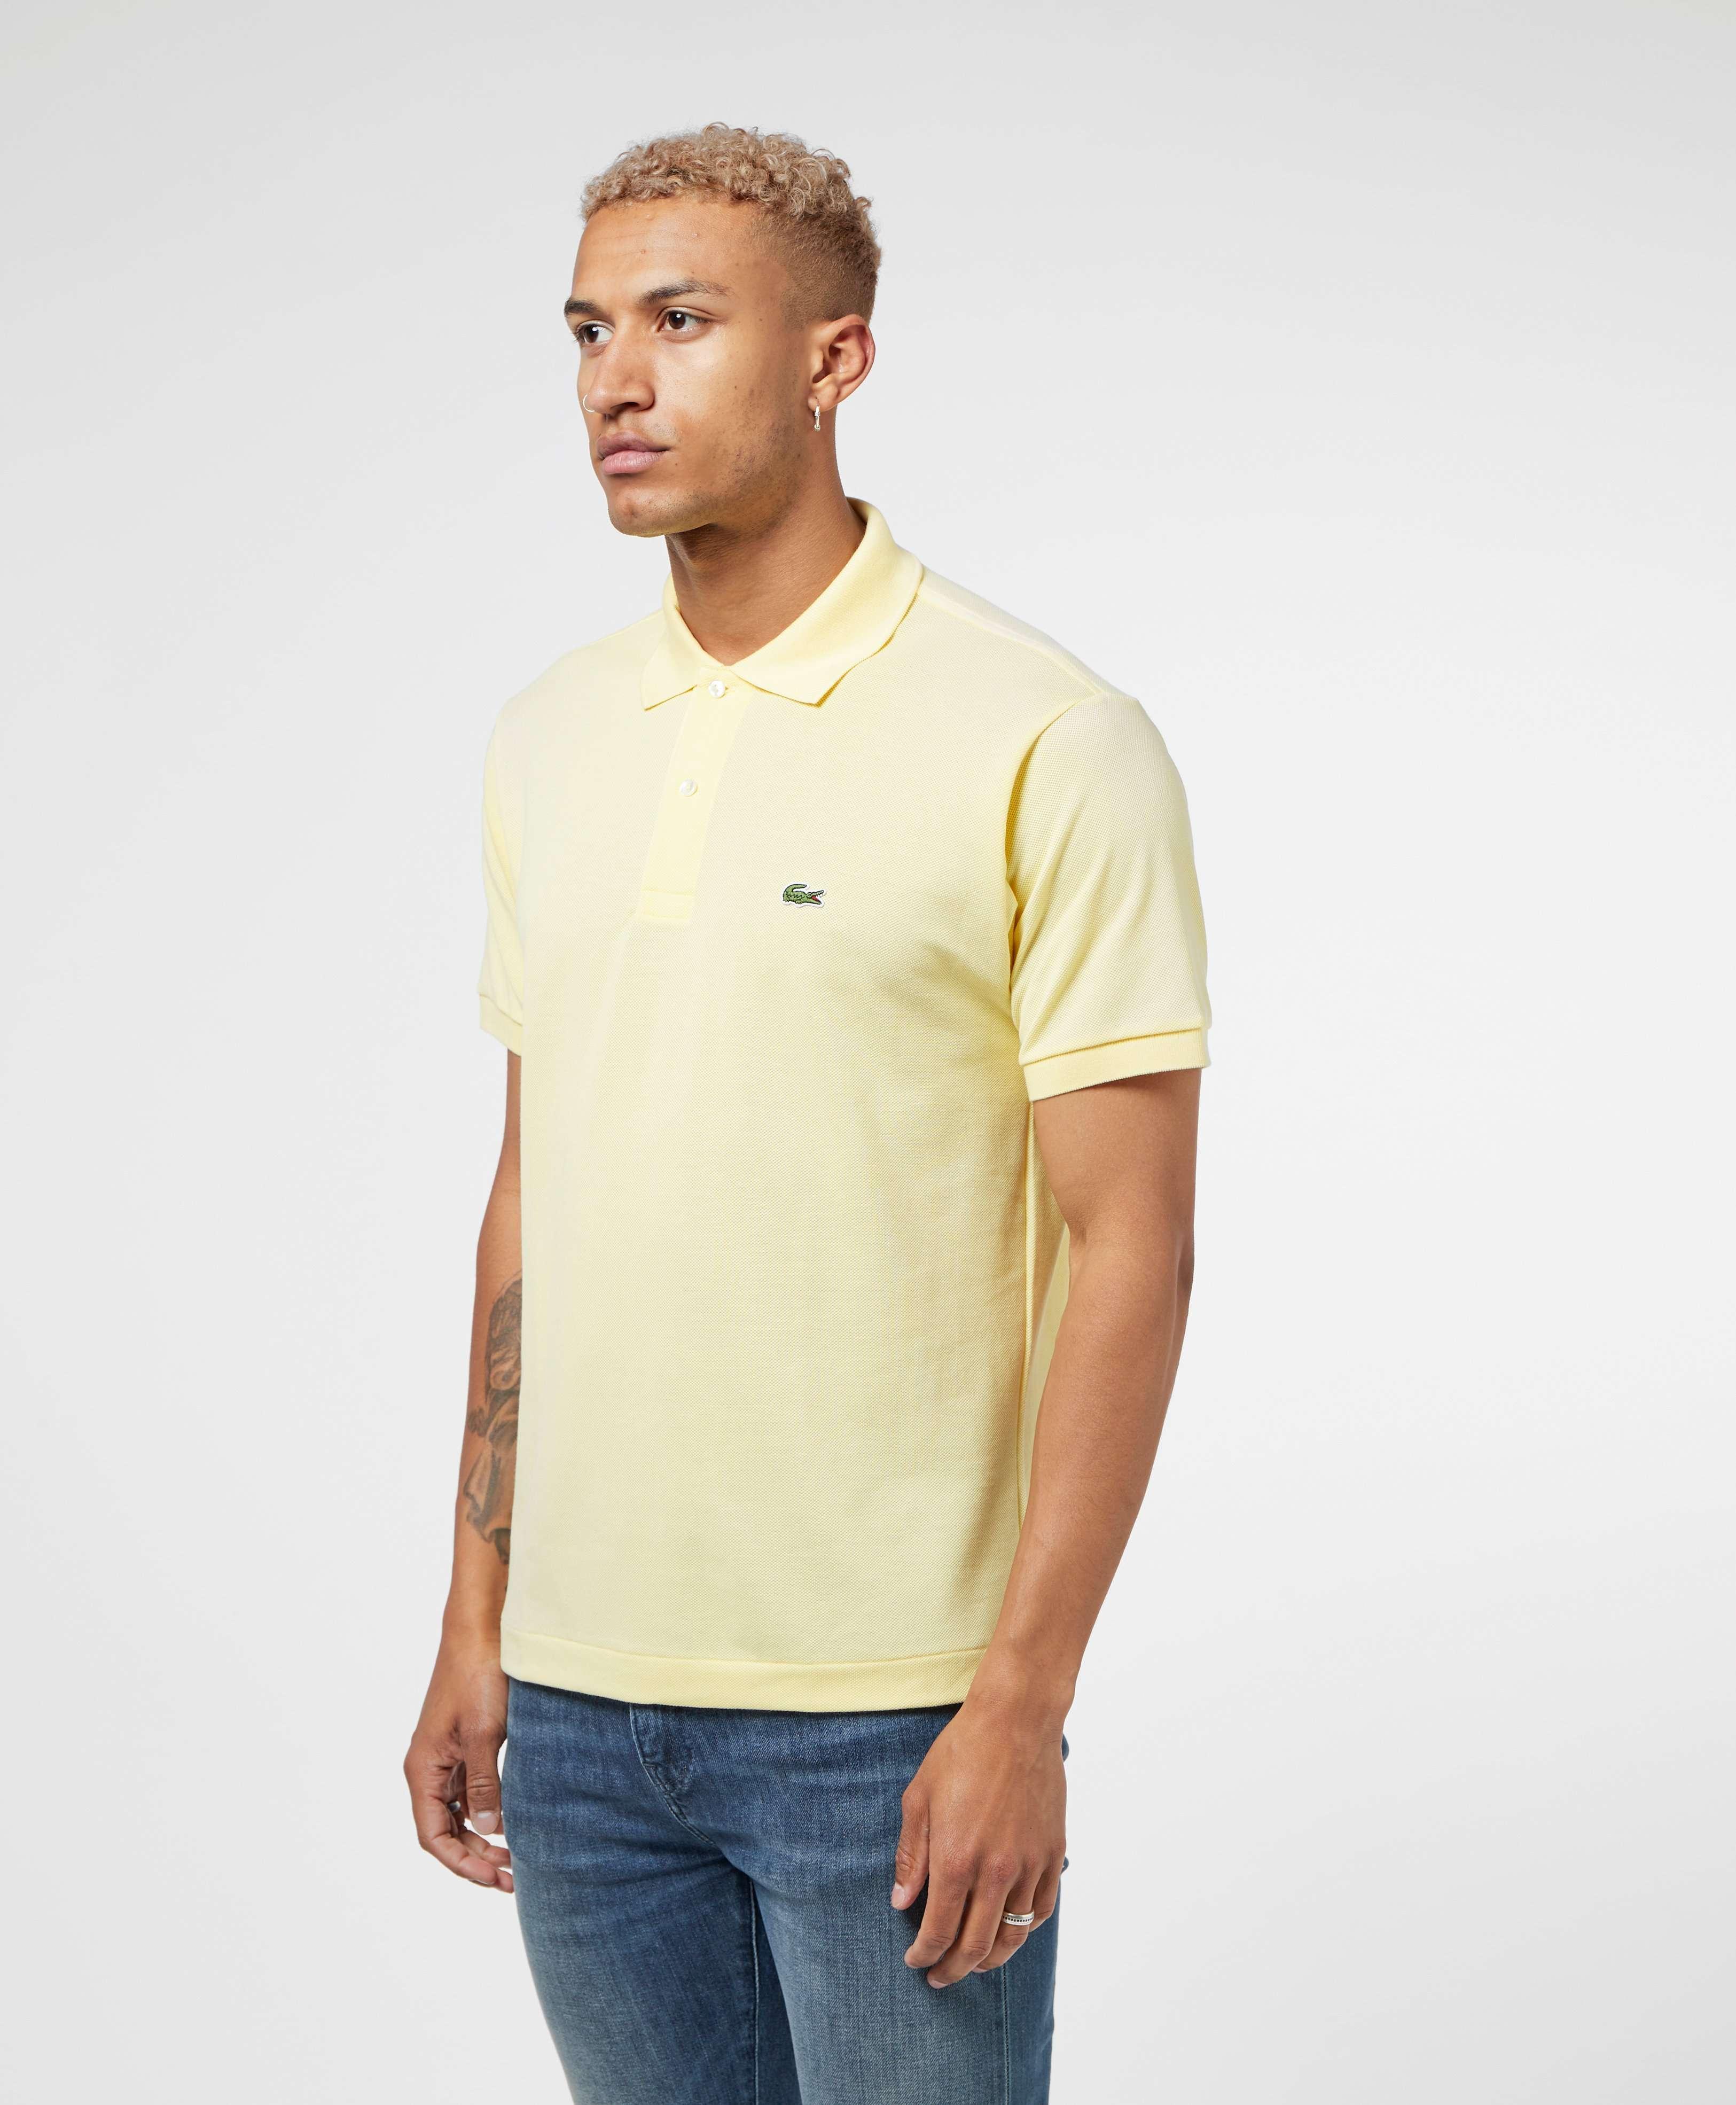 Lacoste L1212 Short Sleeve Polo Shirt